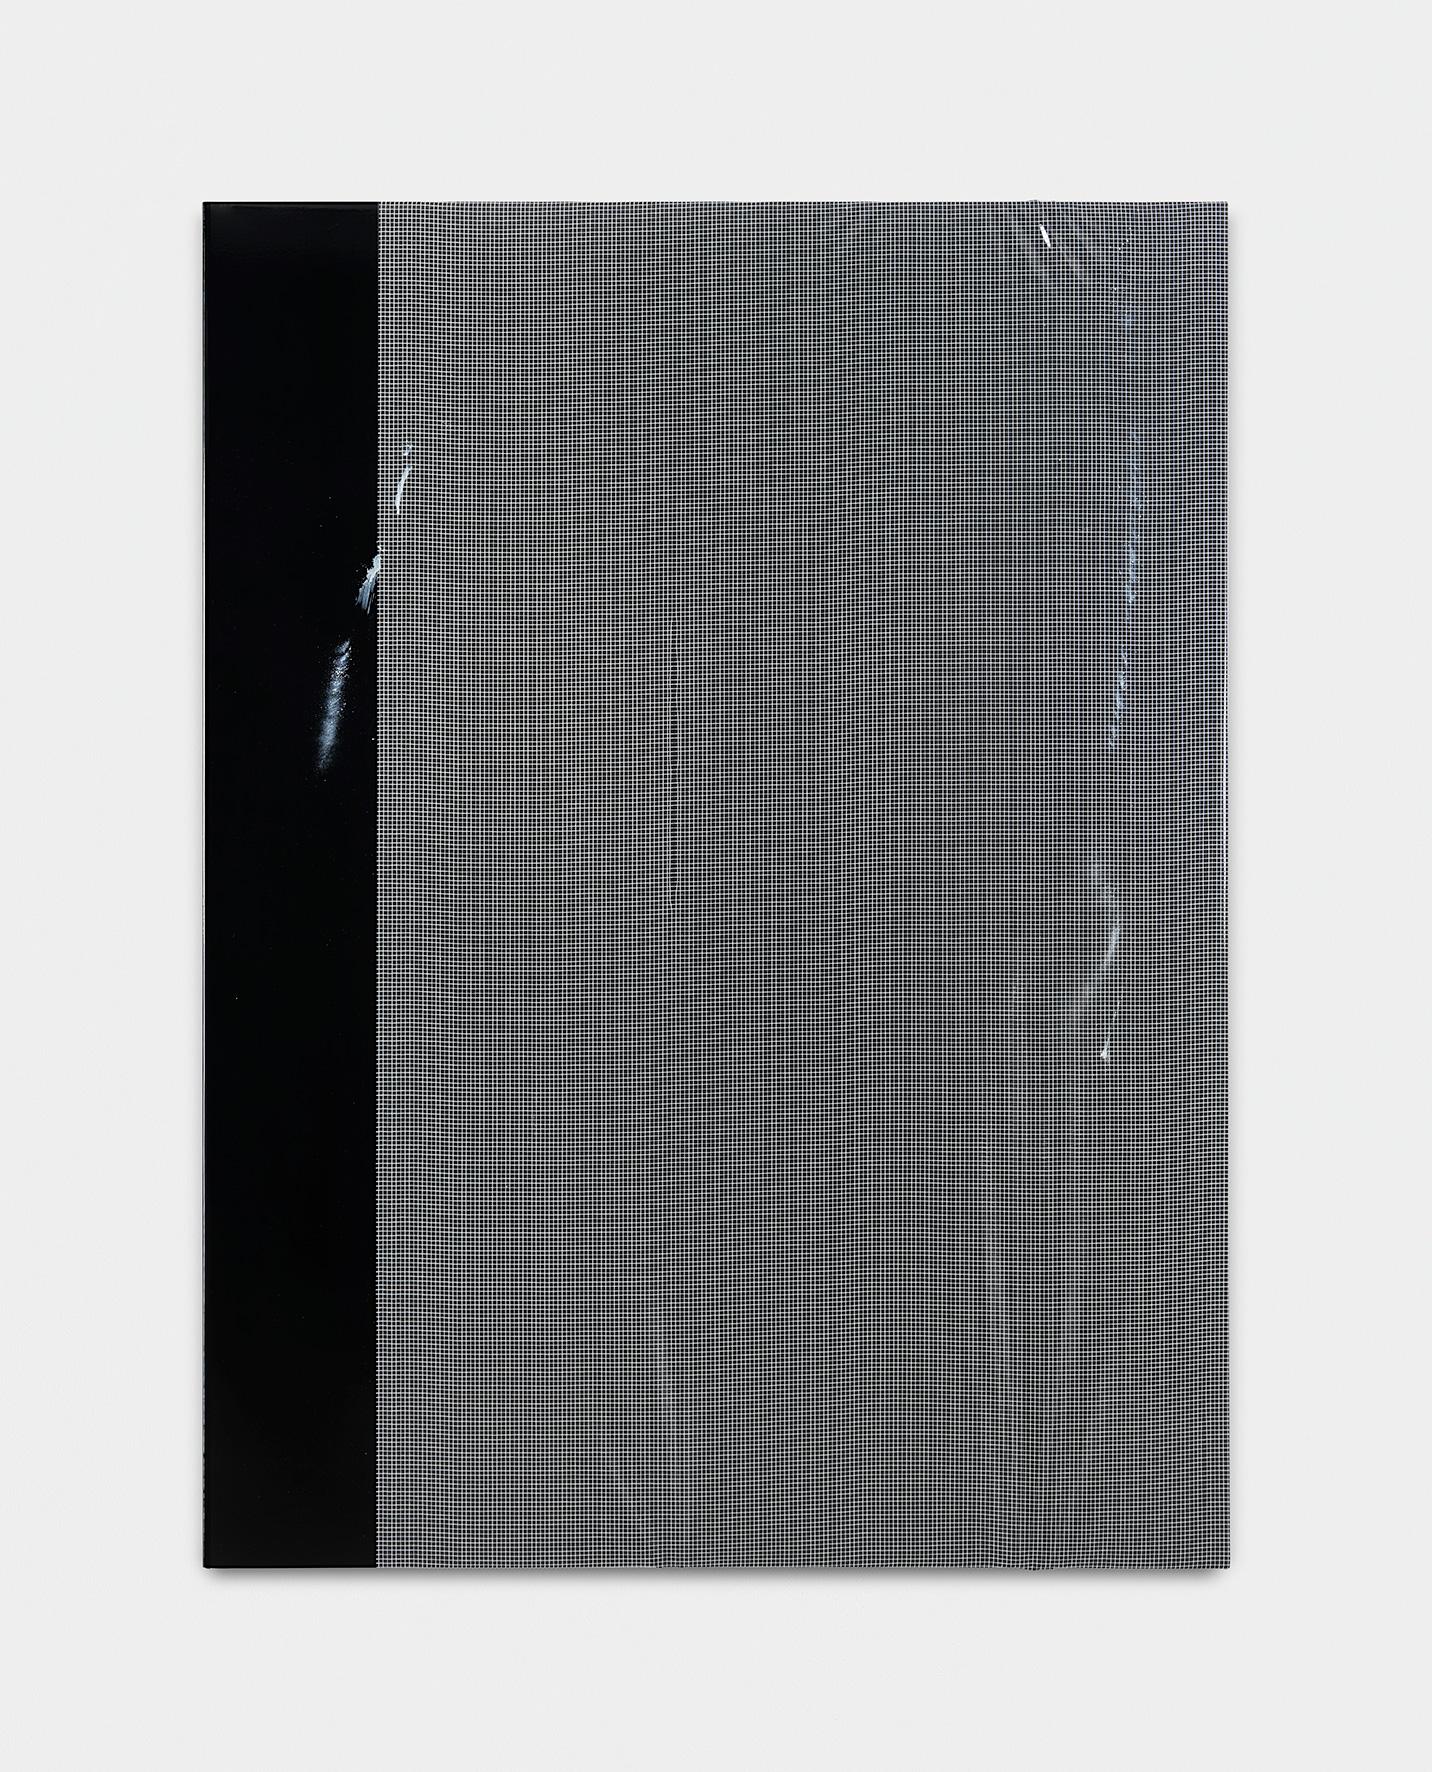 190801 | 2019 | Acryl, Lack, Armierungsfolie auf Leinwand | 160 x 120 cm | ©GALERIE ALBER